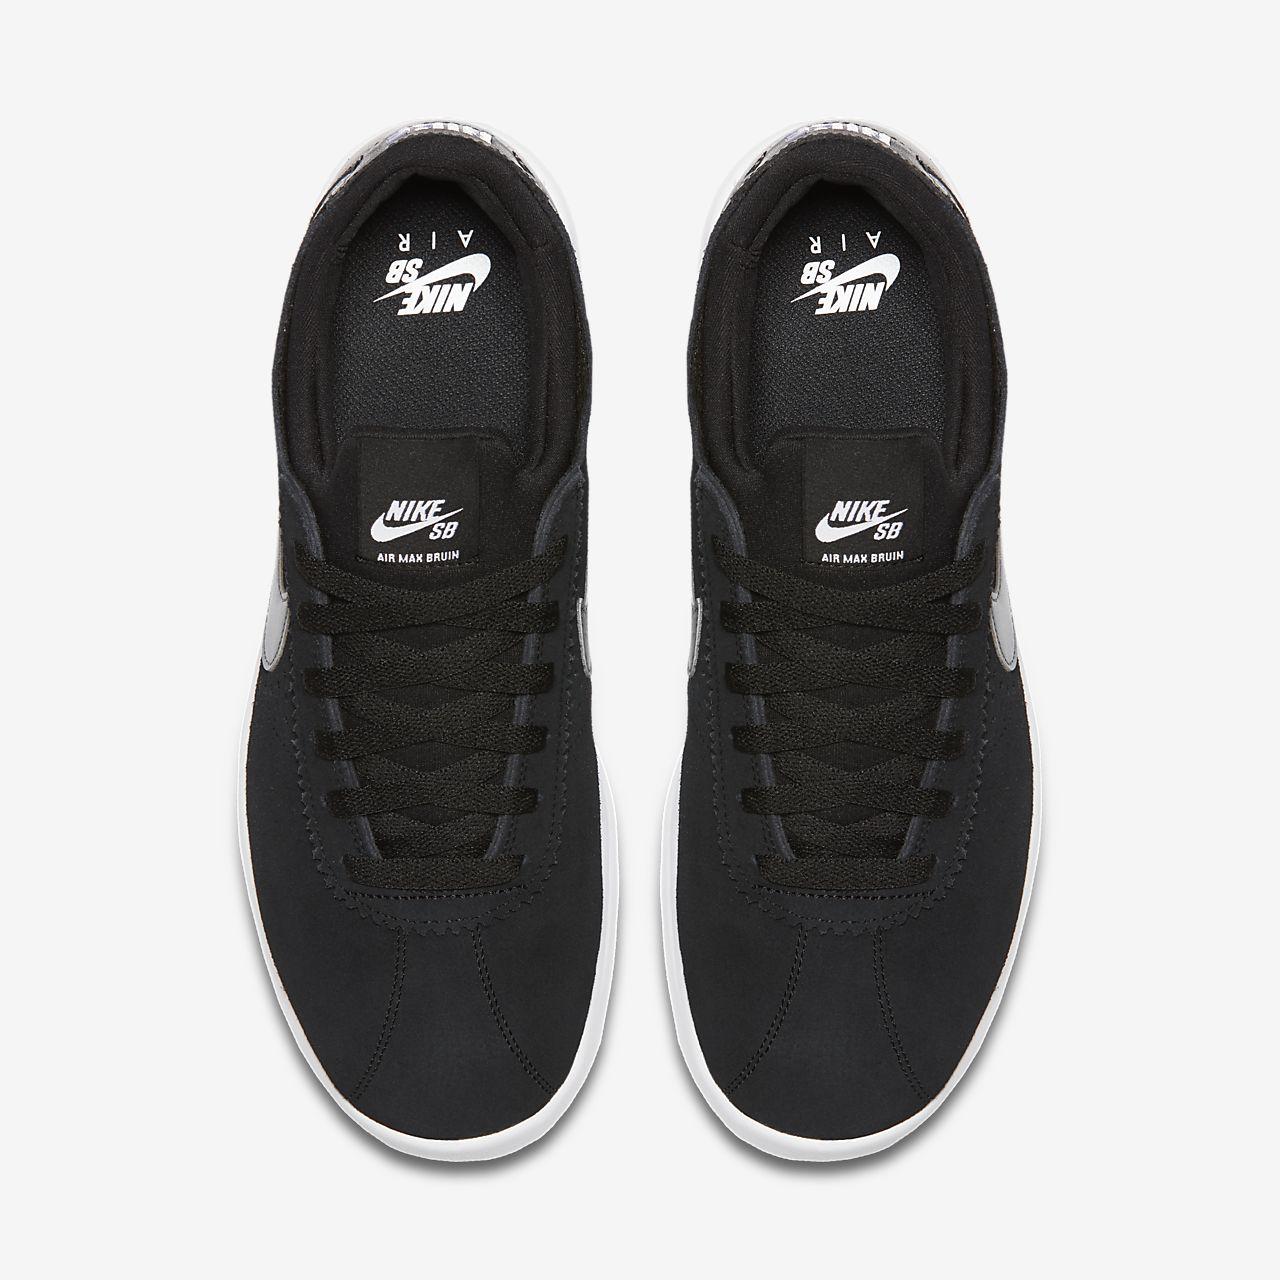 0fc8fb39ac32 Nike SB Air Max Bruin Vapor Men s Skate Shoe. Nike.com AU